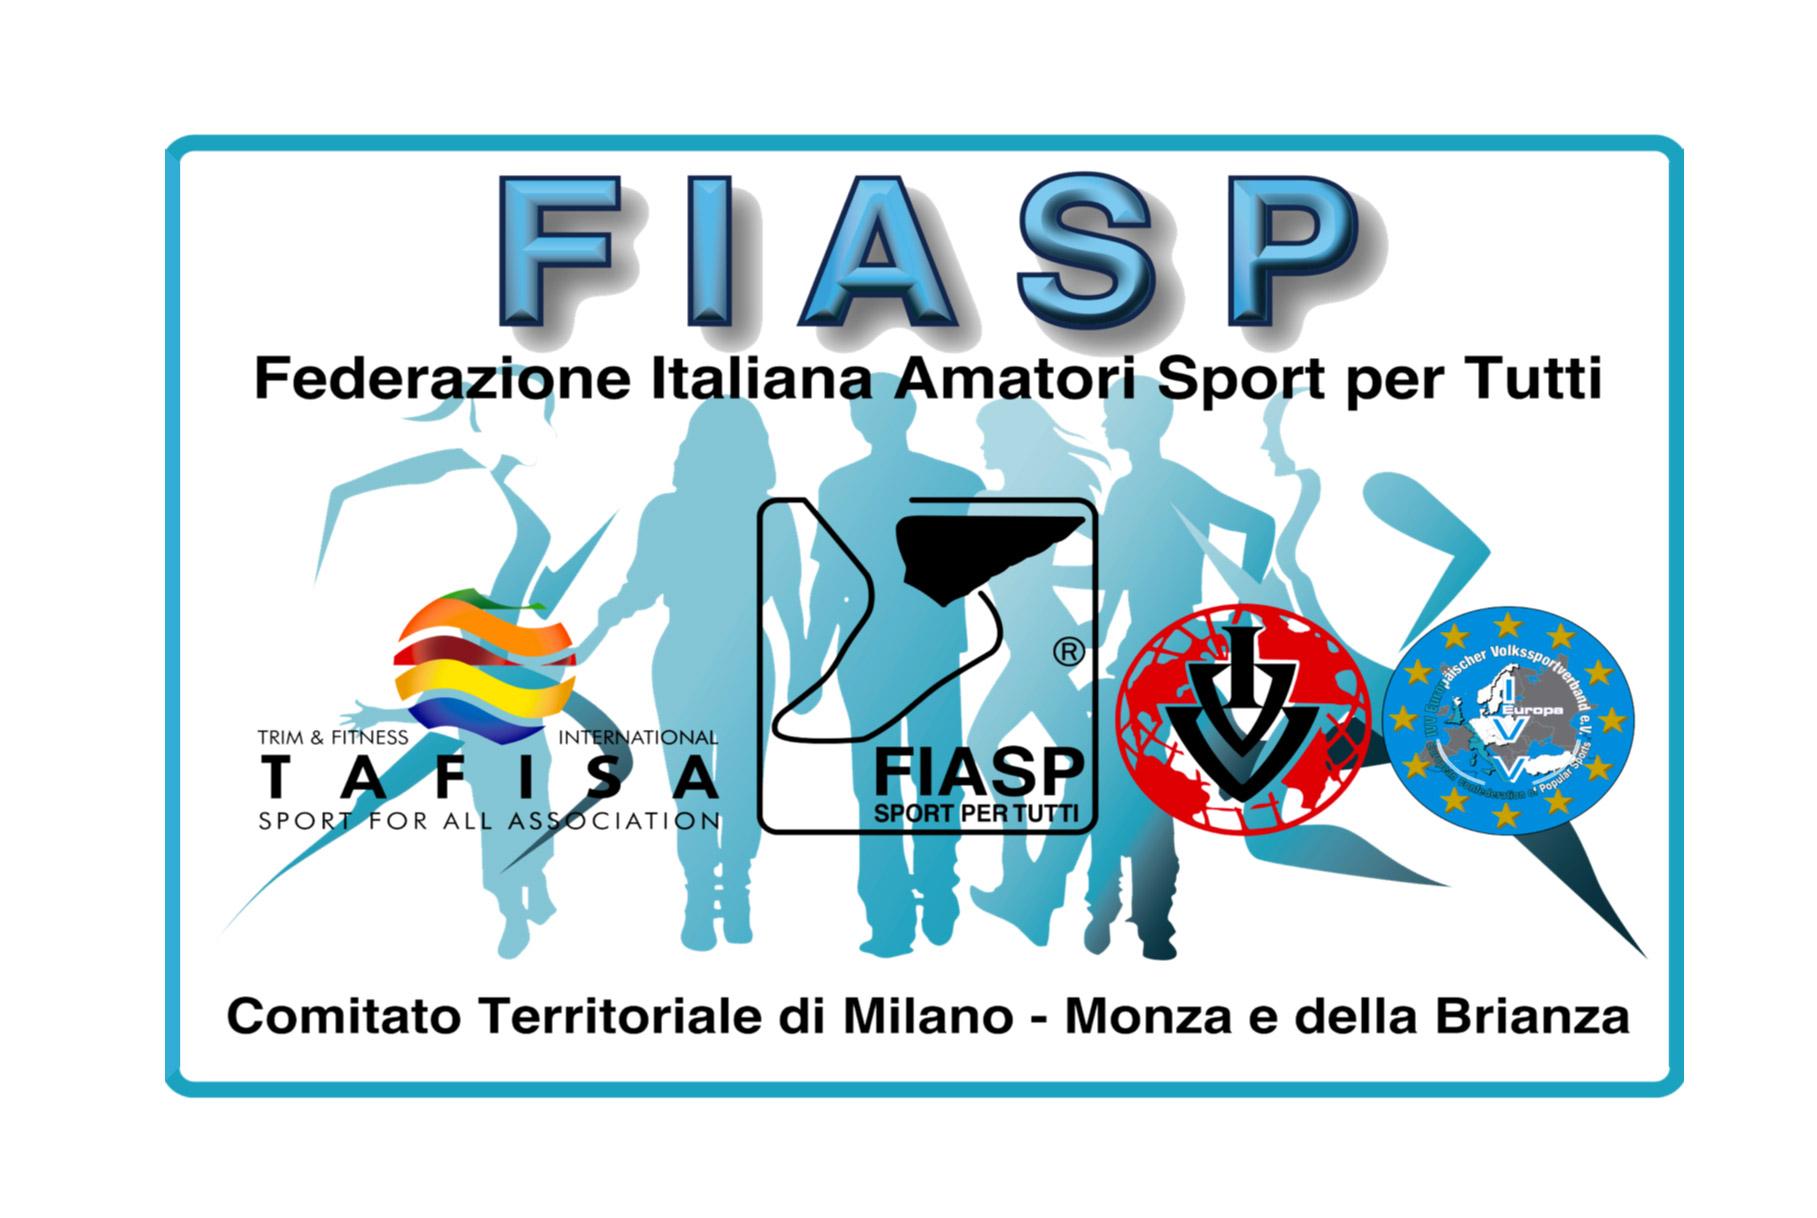 Fiasp